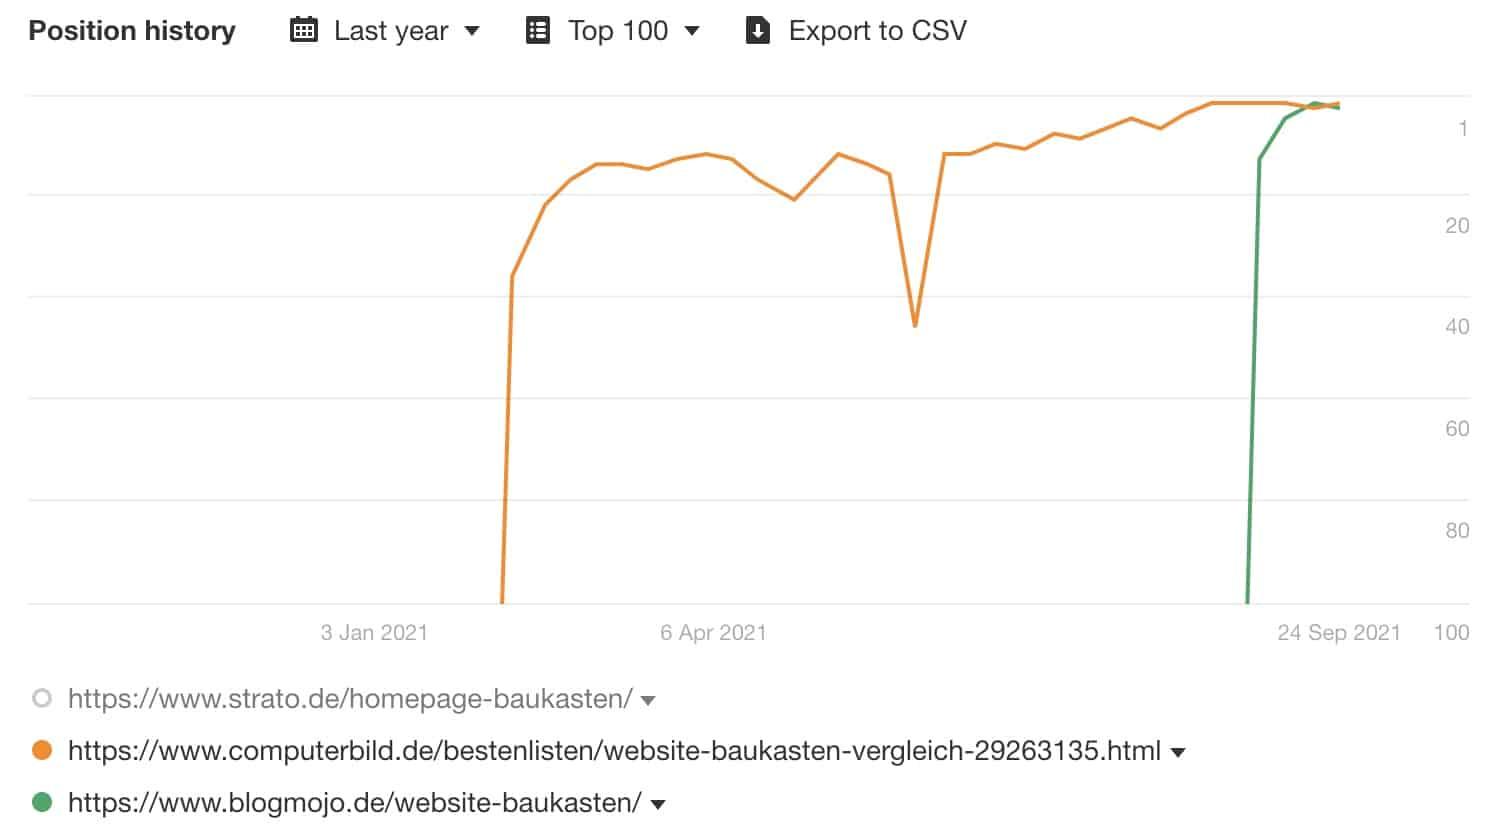 Position History: Blogmojo vs. Computerbild